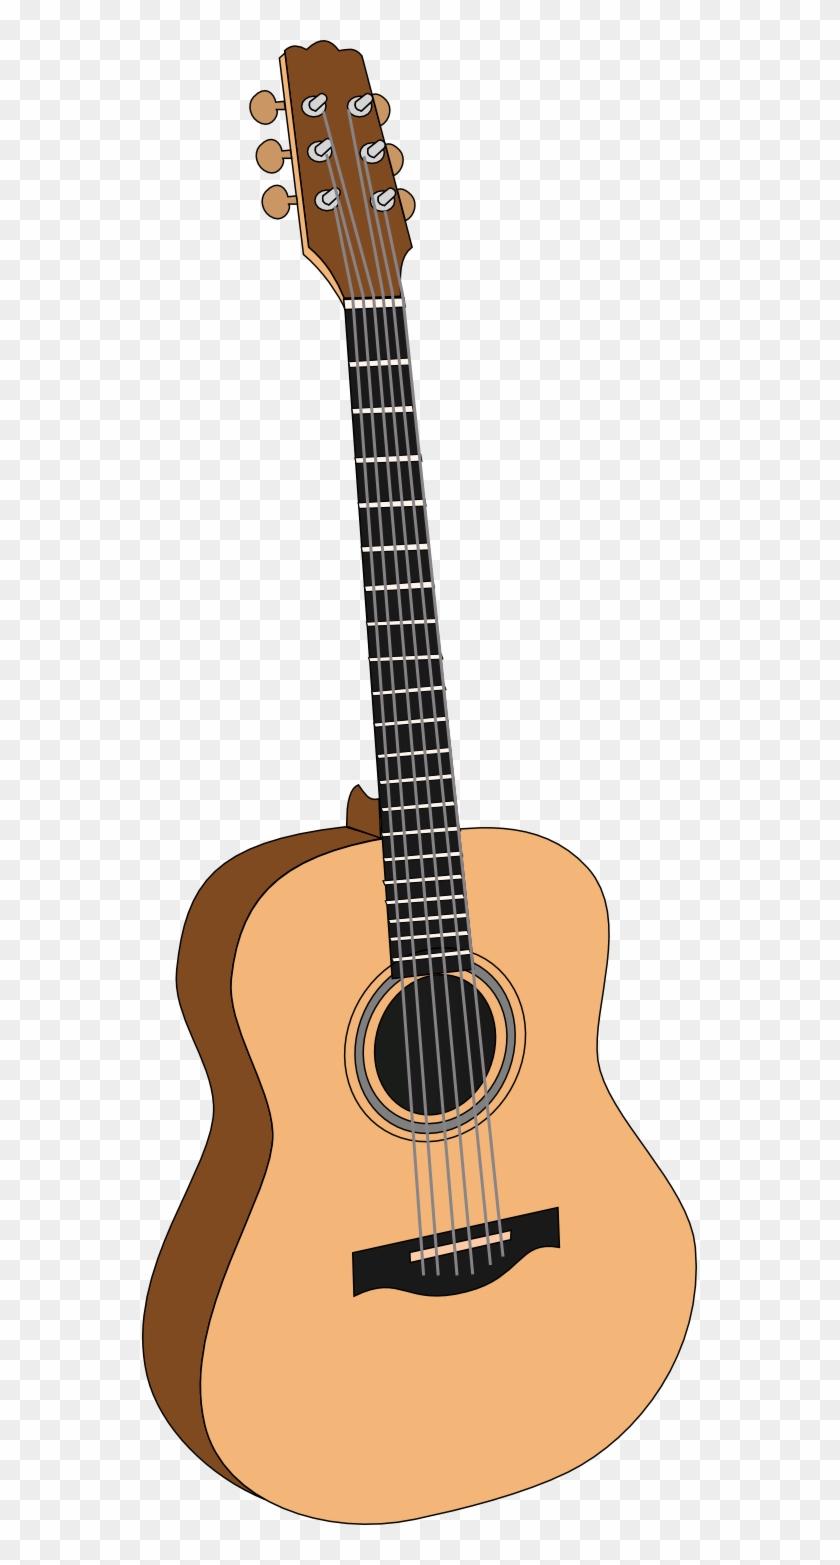 Acoustic Guitar Png.